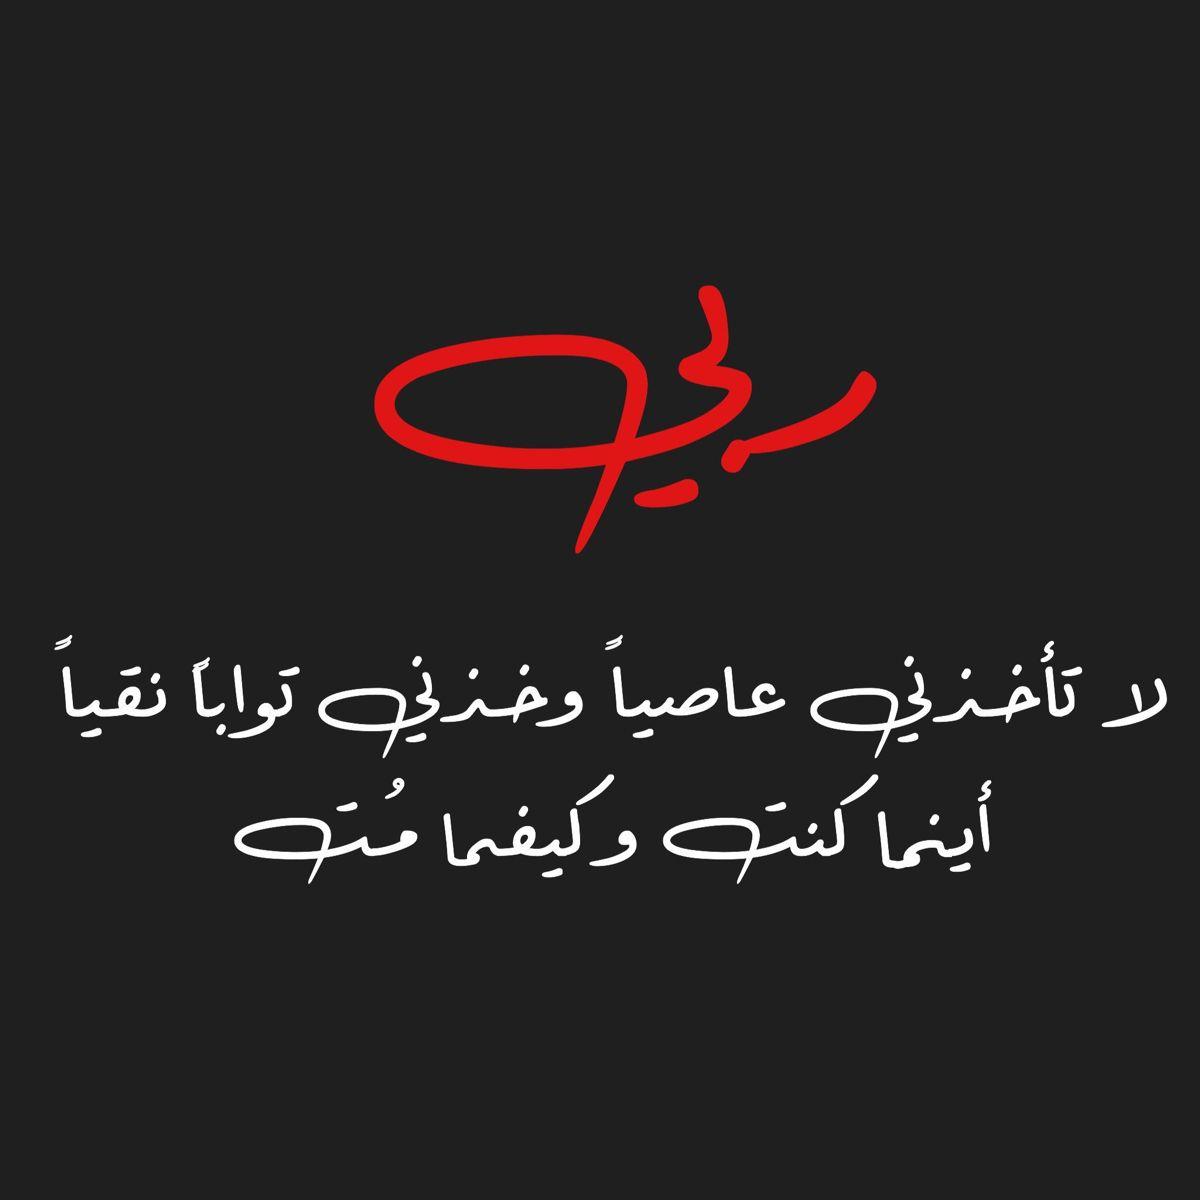 Pin By حمد البلوشي On دعاء Calligraphy Arabic Calligraphy